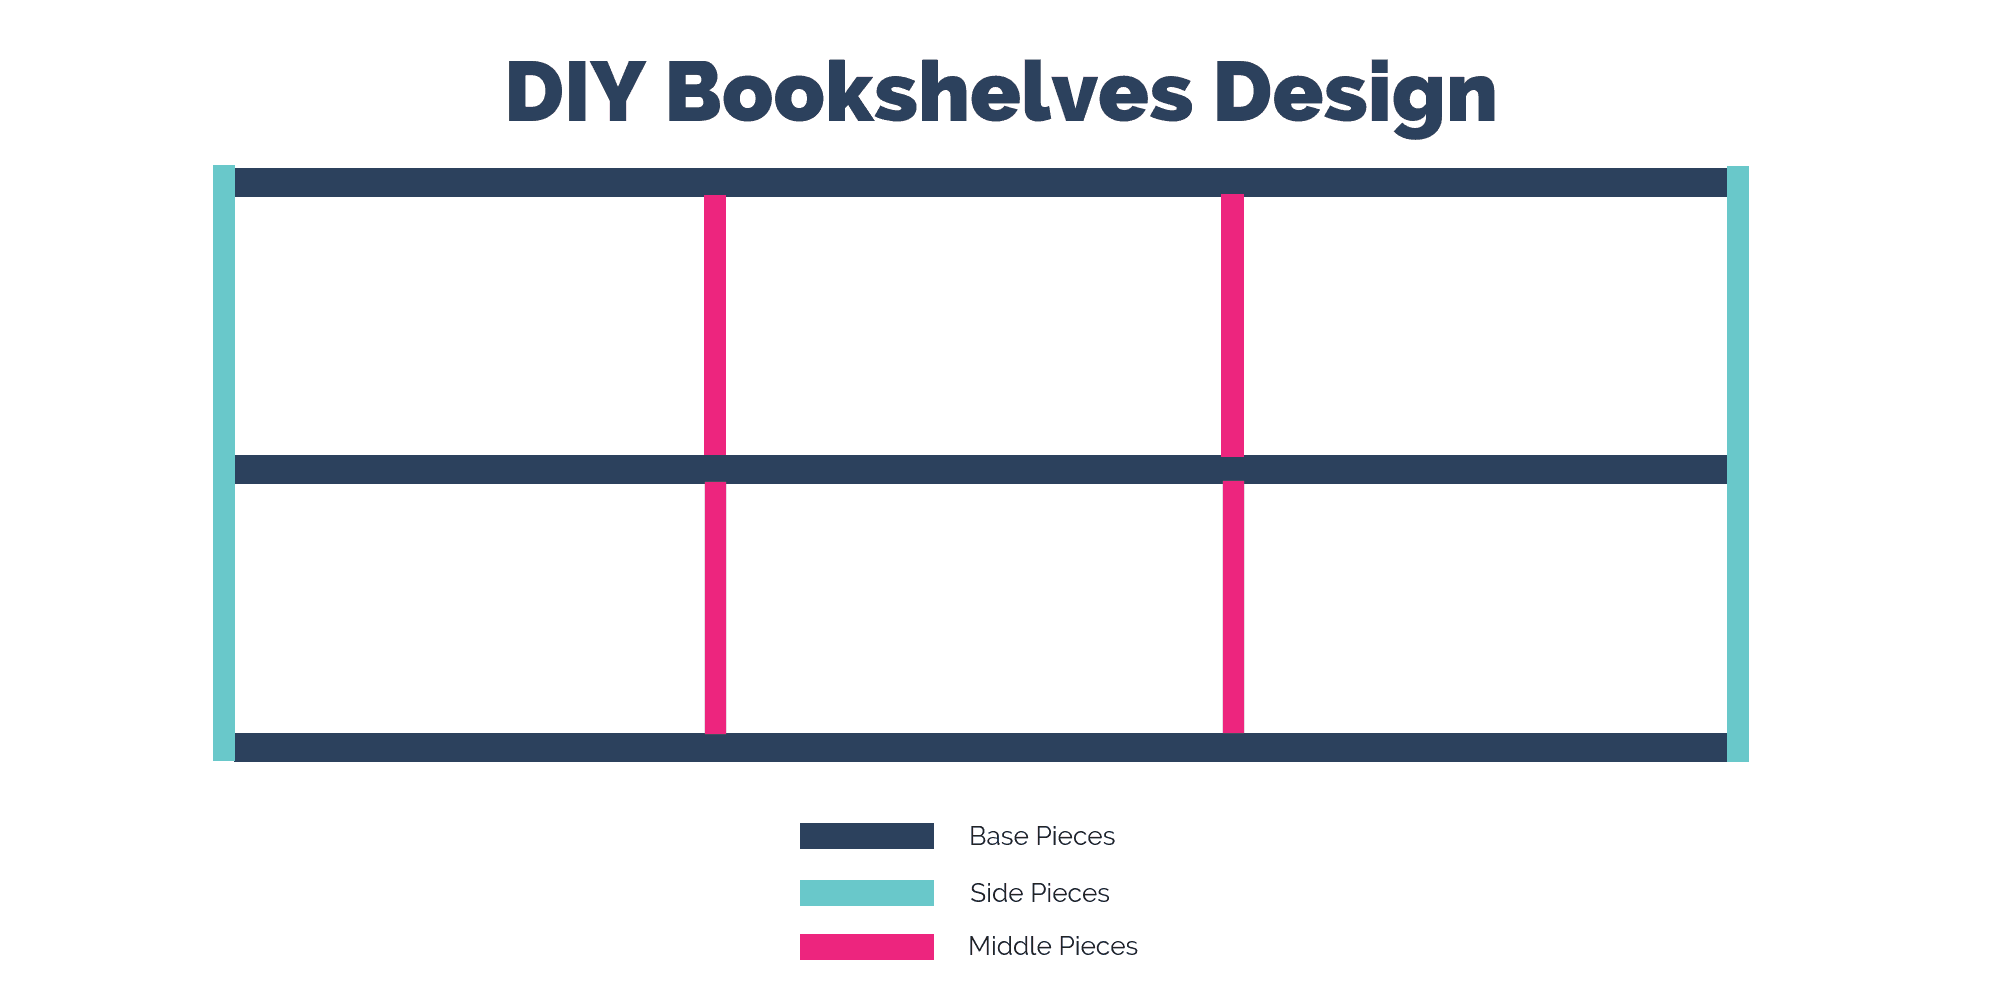 diy bookshelves design plan